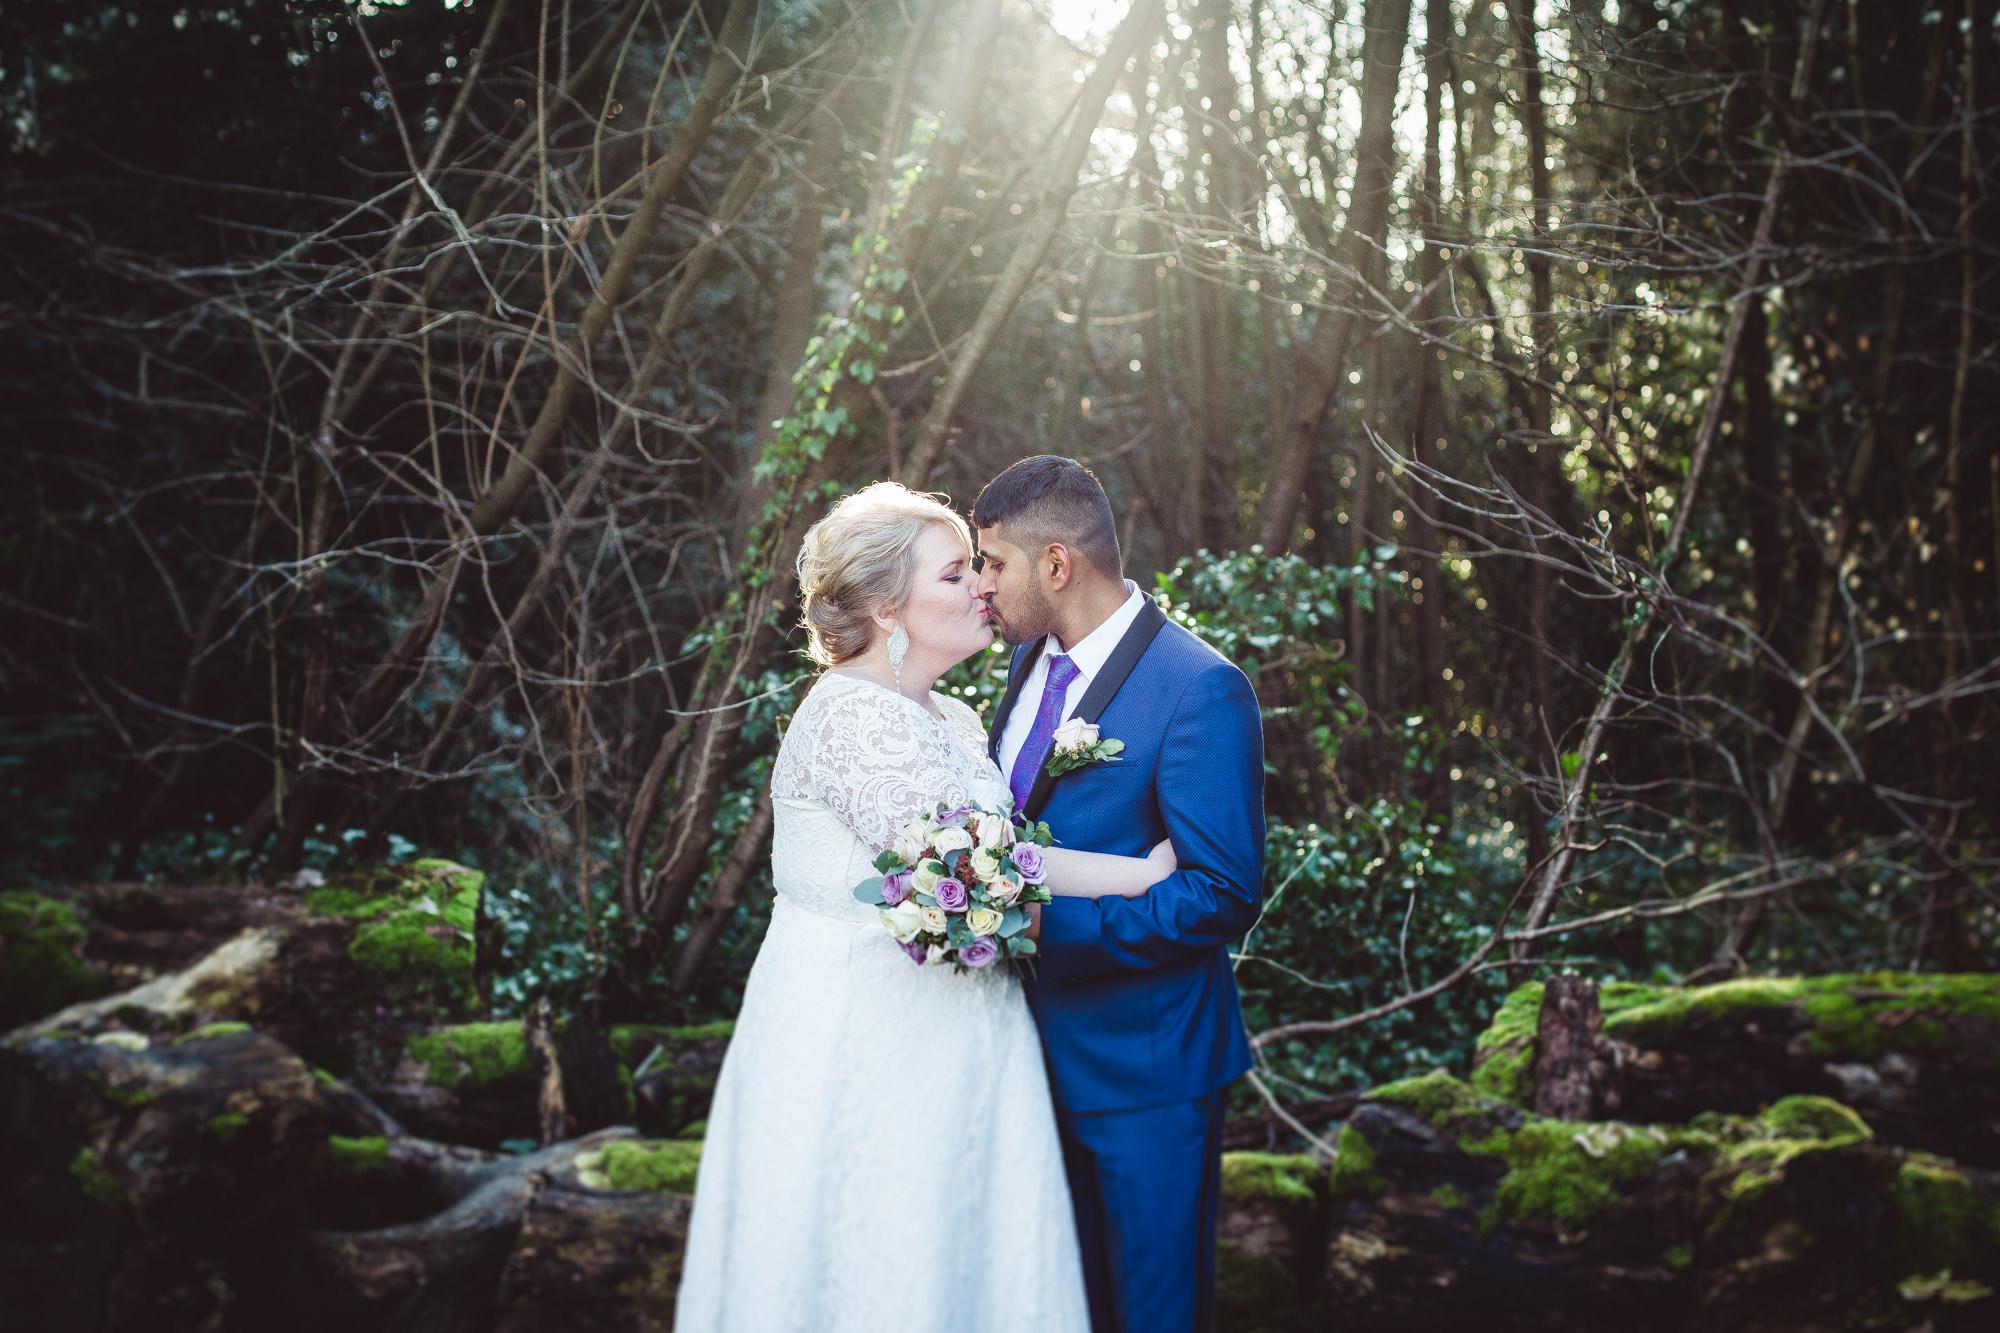 London Wedding Vilcinskaite Photo 31.jpg